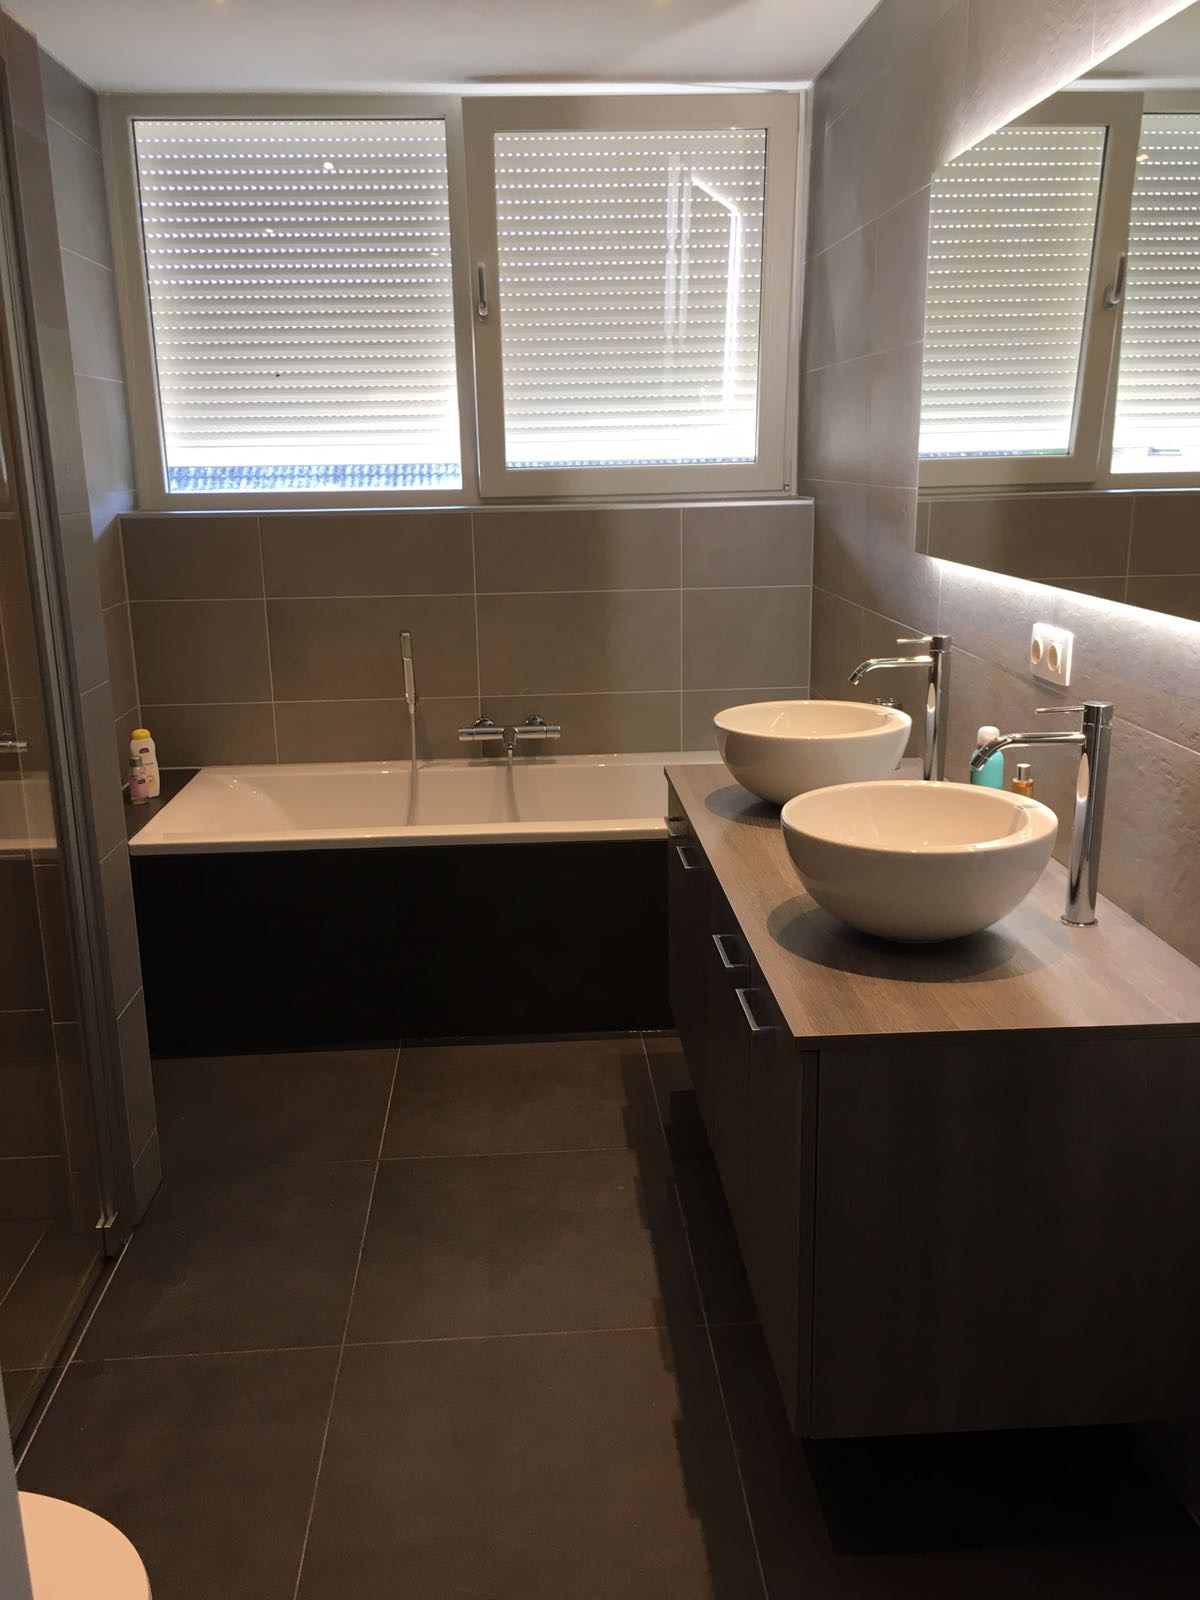 Beautiful Badkamer Met Dakkapel Images - Moderne huis - clientstat.us